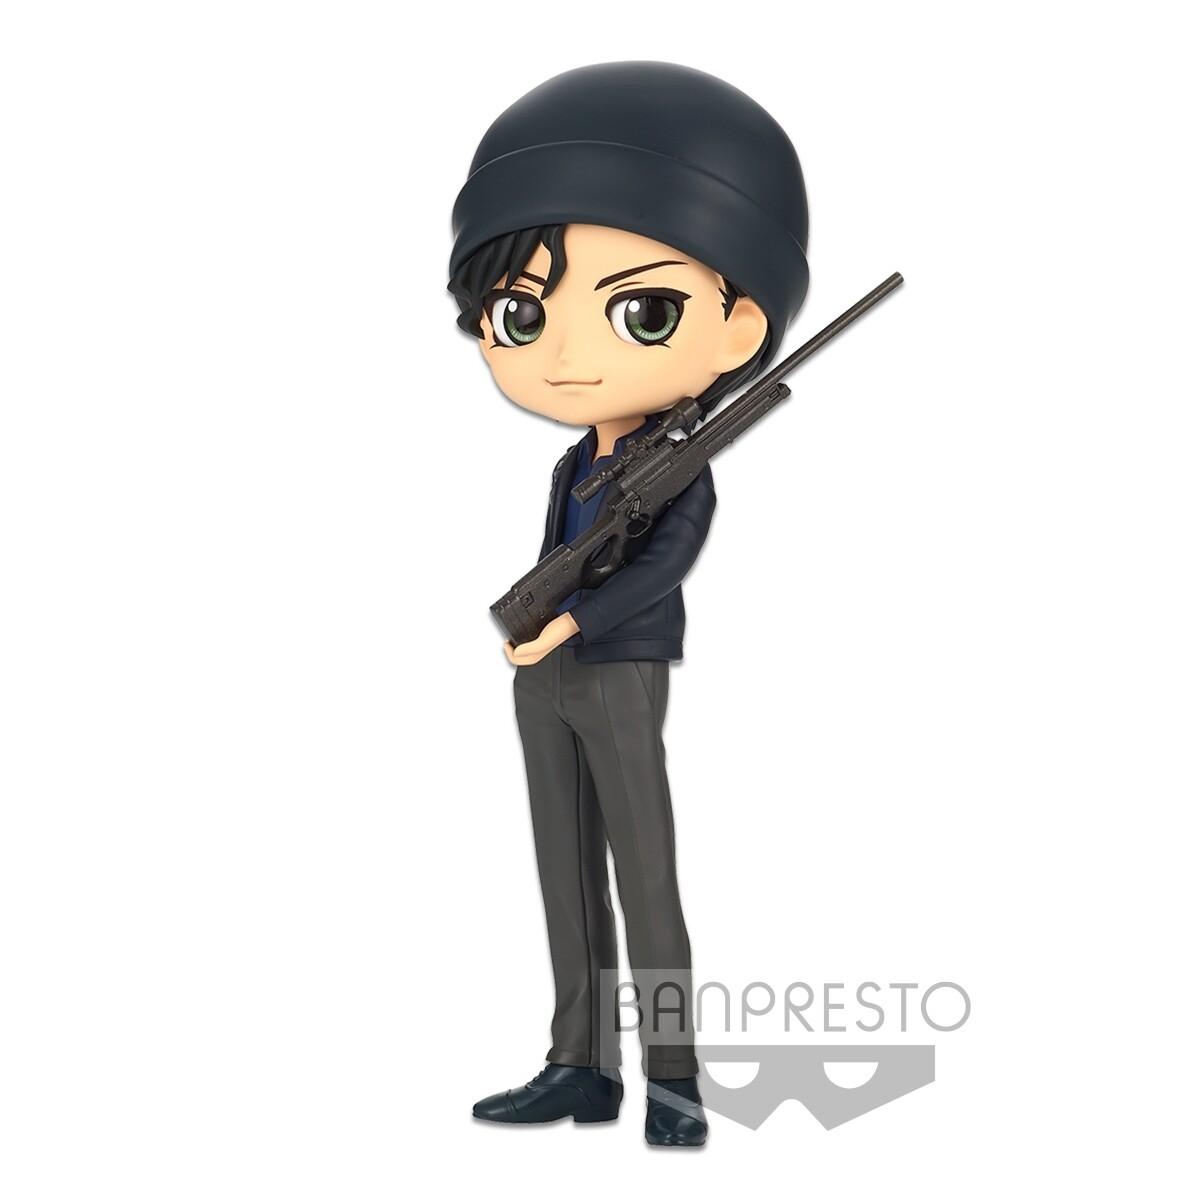 PRE-ORDER Banpresto Detective Conan Q Posket Shuichi Akai Ver. B